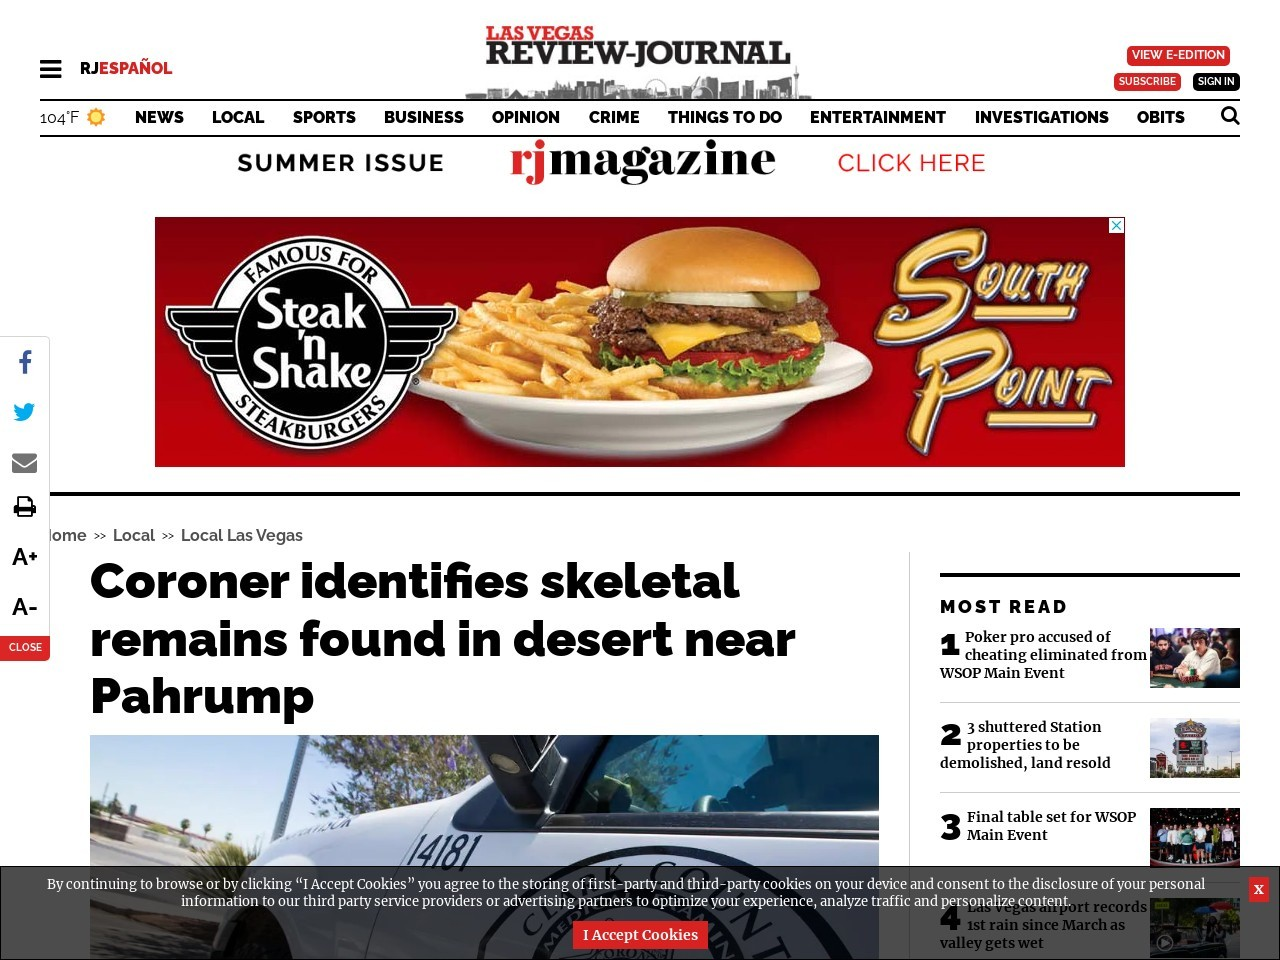 Coroner identifies skeletal remains found in desert near Pahrump